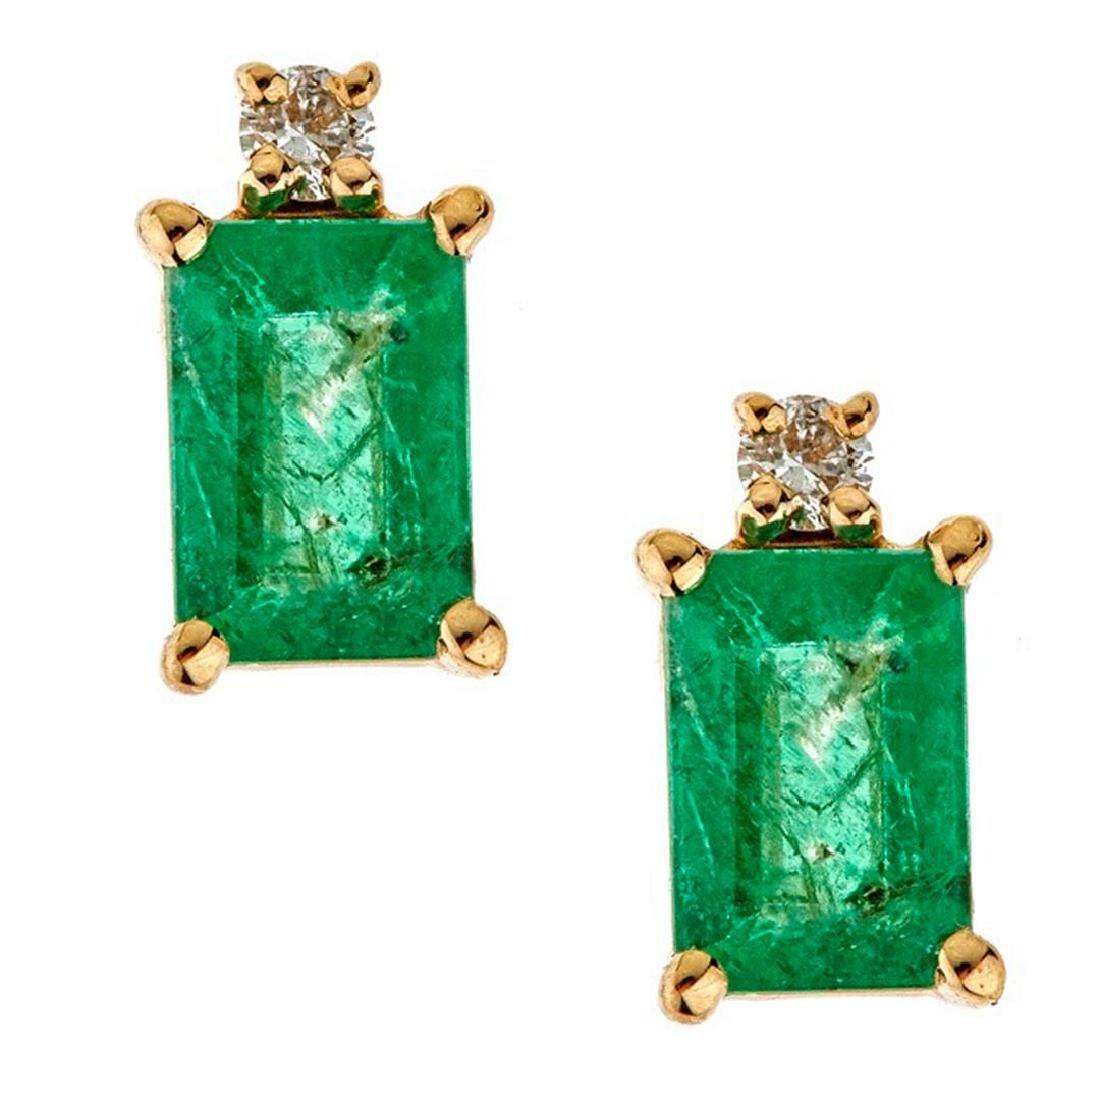 1.13 ctw Emerald and Diamond Earrings - 14KT Yellow